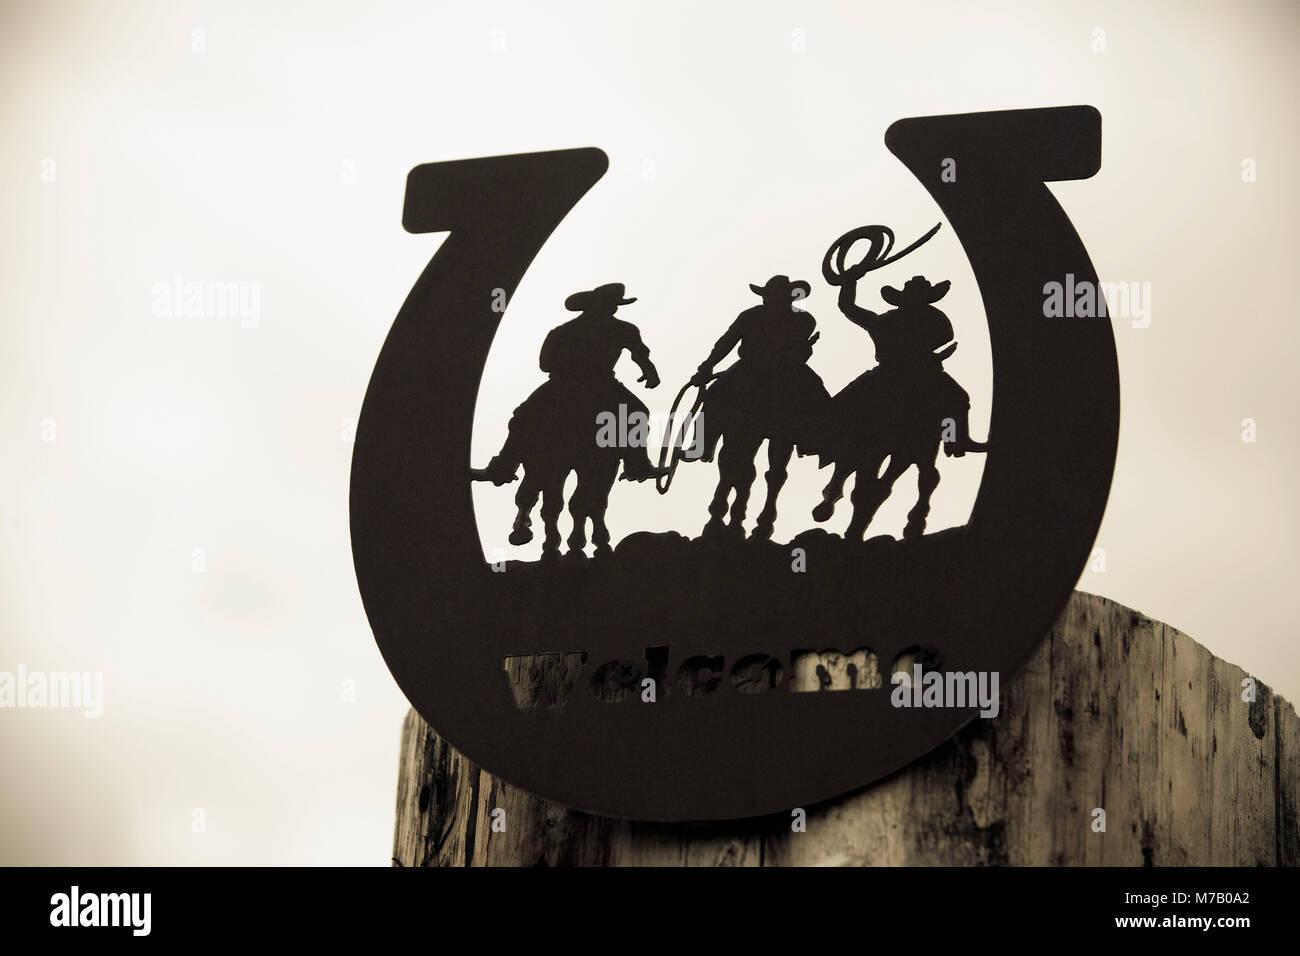 Close-up of a welcome sign, Montana, USA - Stock Image